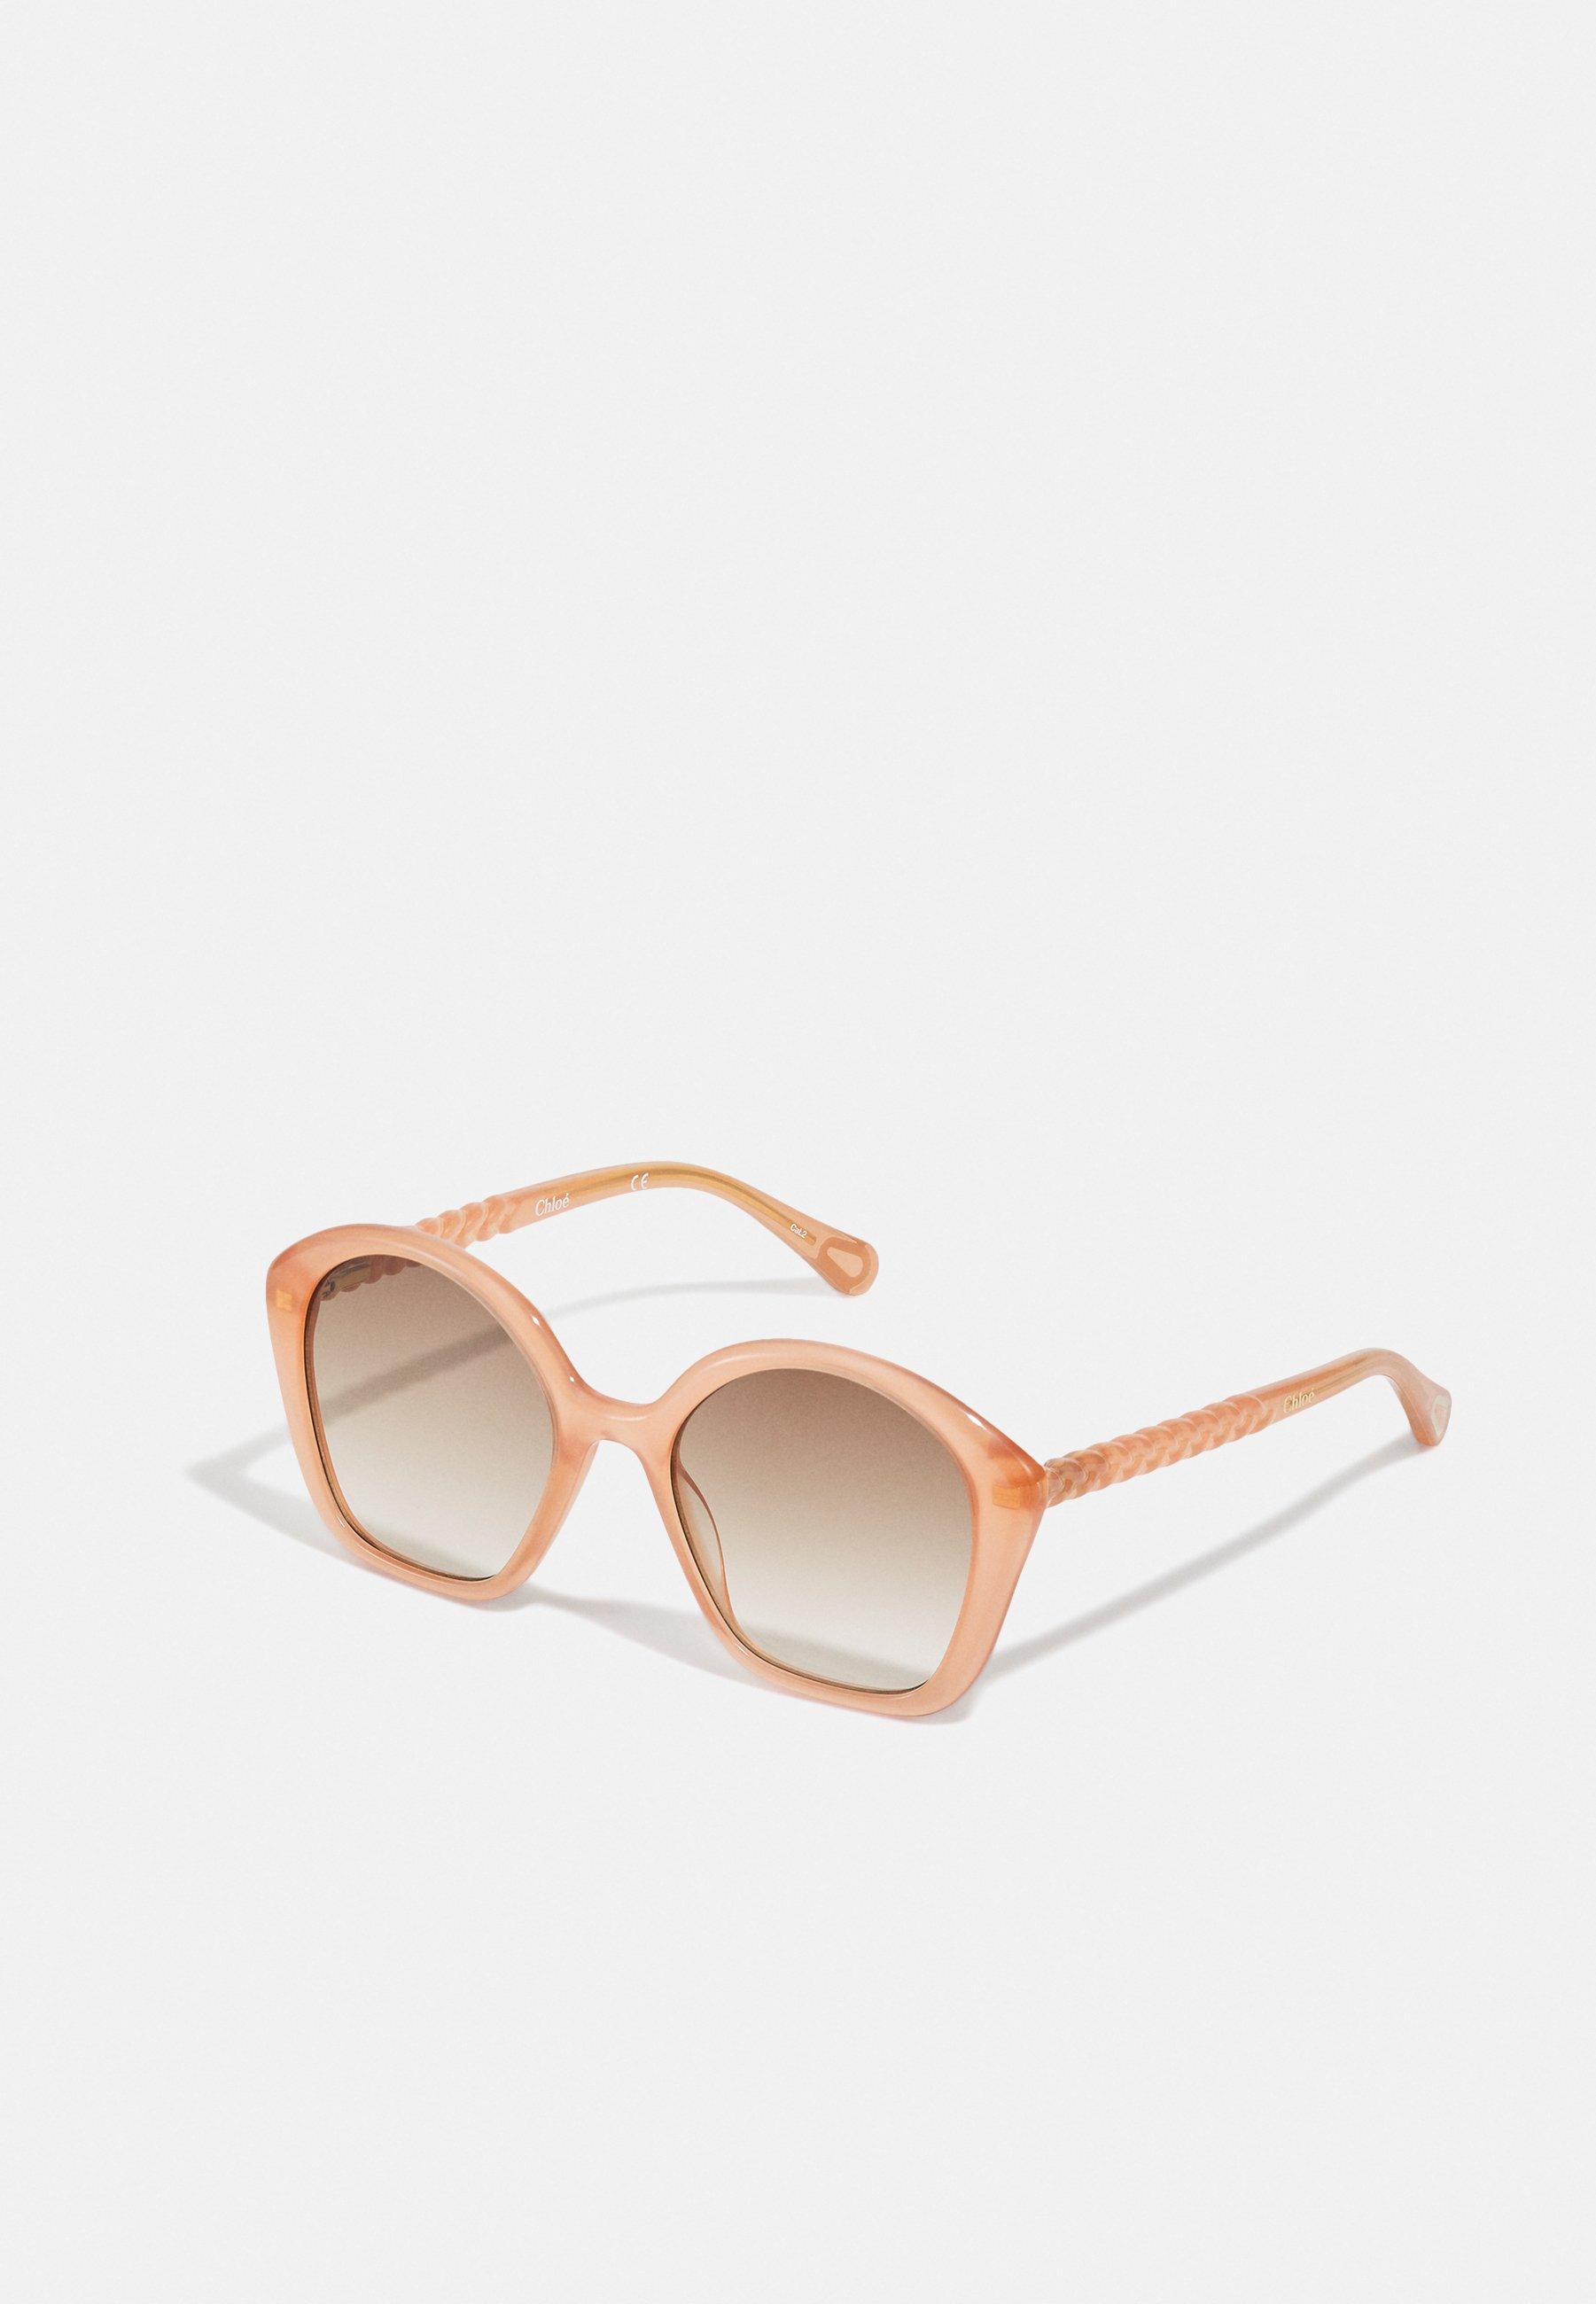 Kids SUNGLASS KID INJECTION UNISEX - Sunglasses